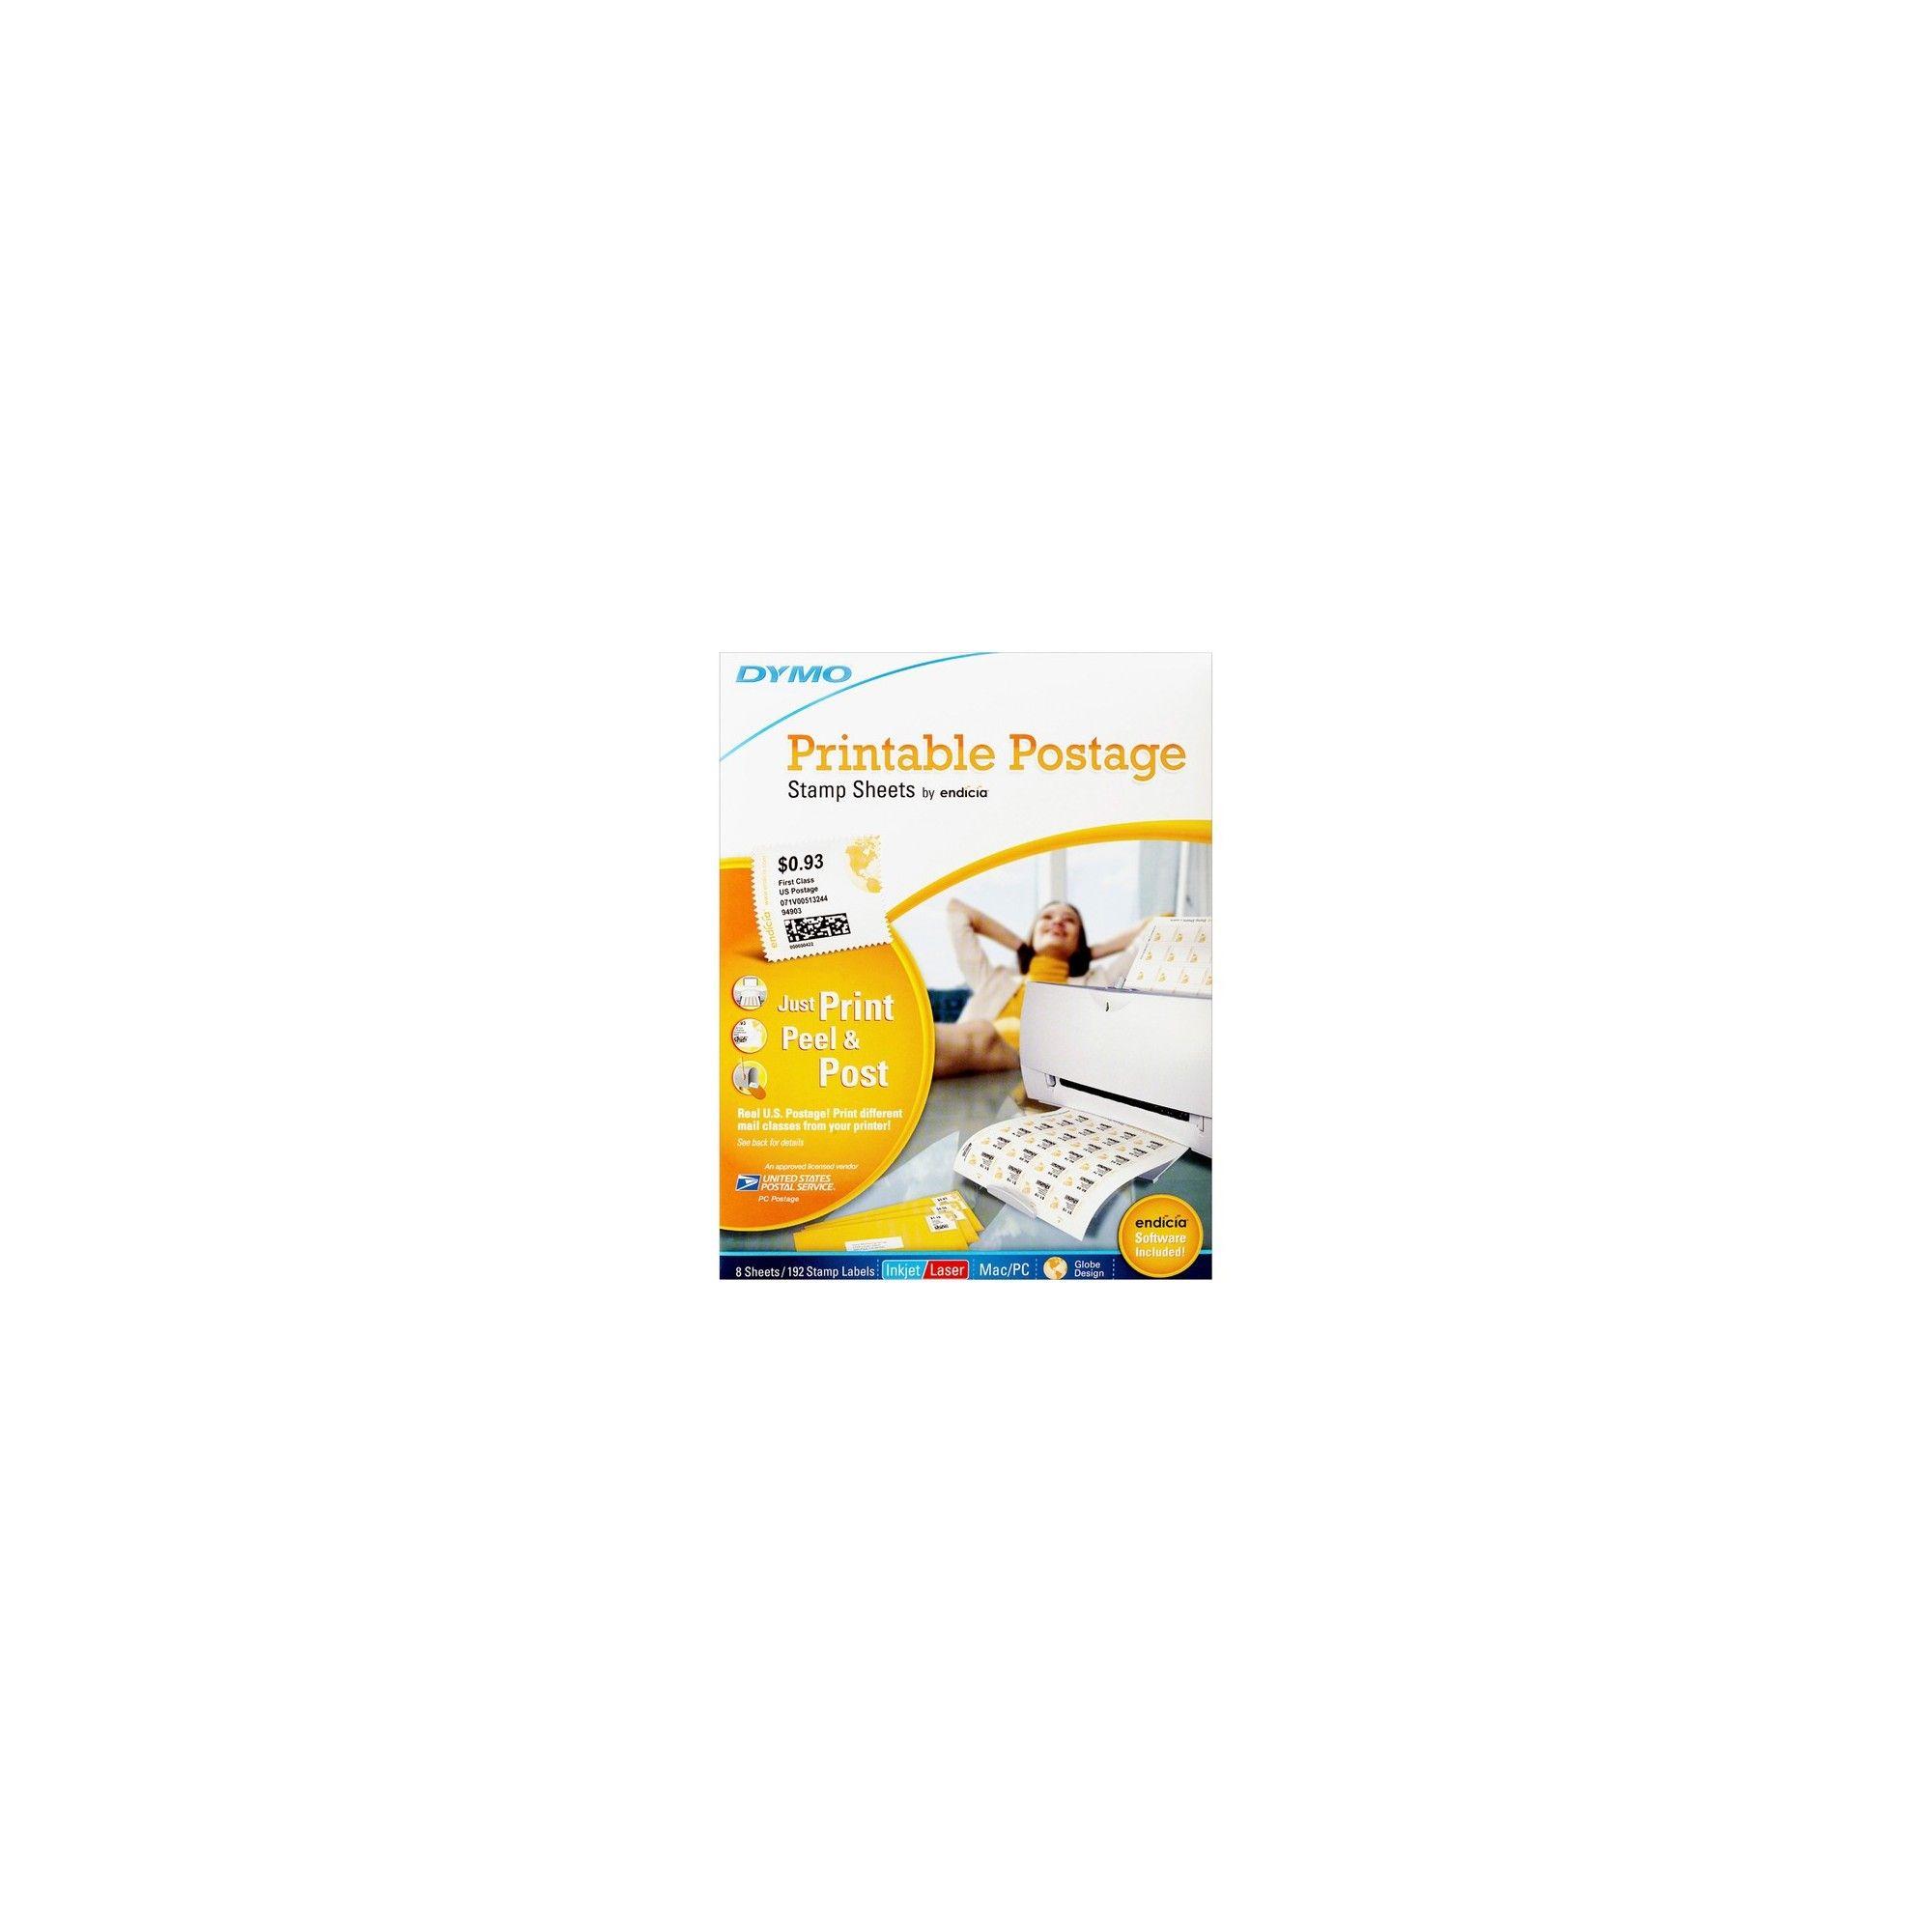 image regarding Dymo Printable Postage called Dymo Printable Postage Stamp Sheets - Laser, Inkjet - White